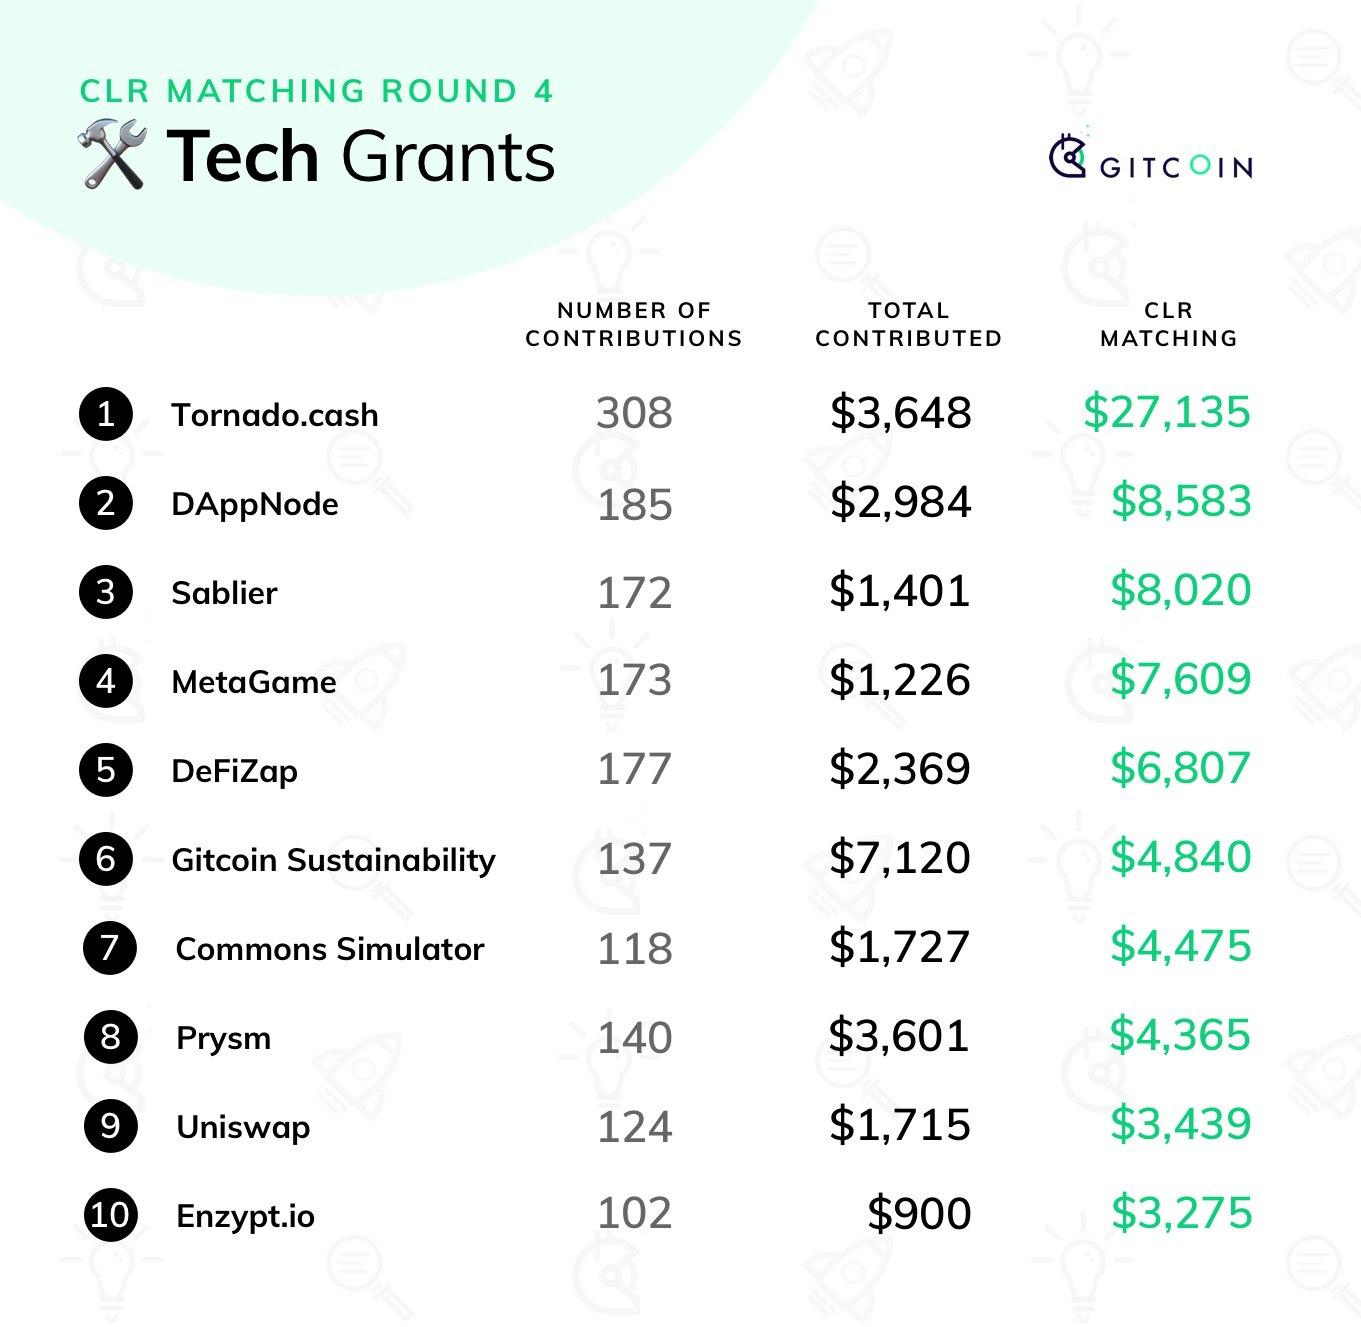 Review of Gitcoin Quadratic Funding Round 4